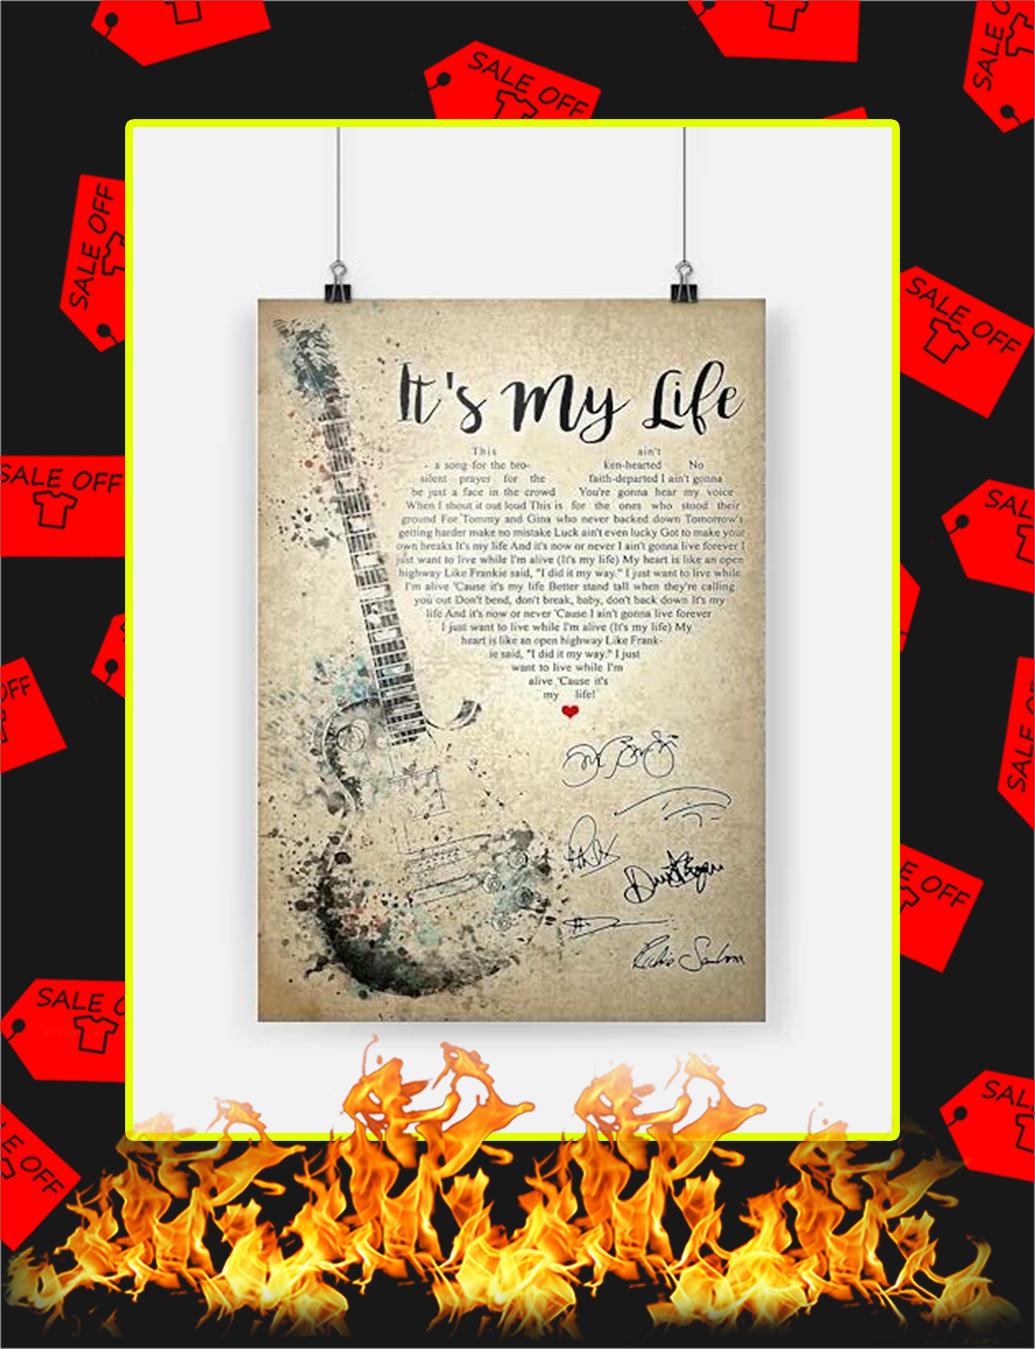 It's My Life Bon Jovi Poster - A4